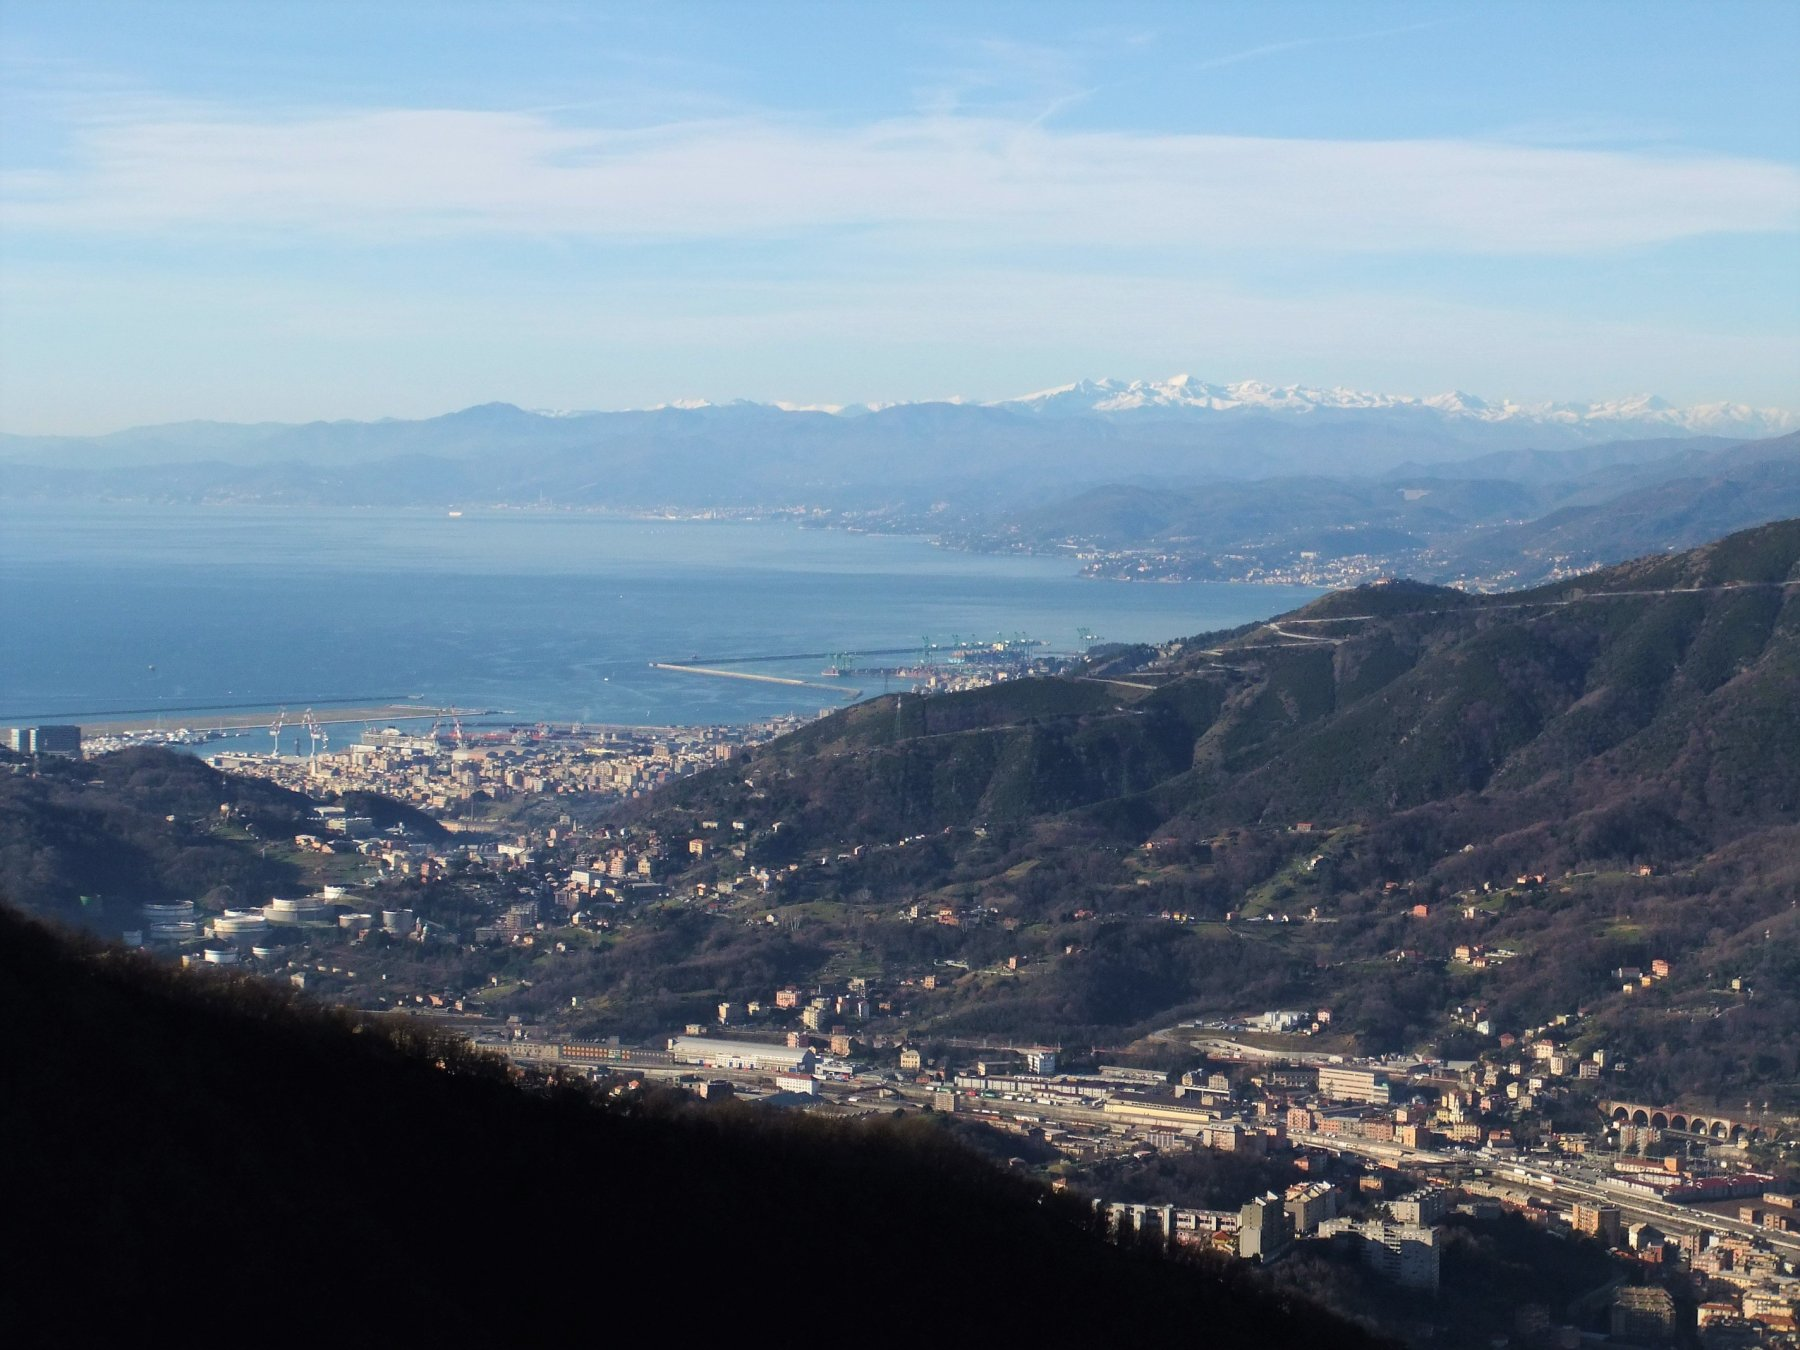 Genova e le Alpi Liguri dal forte